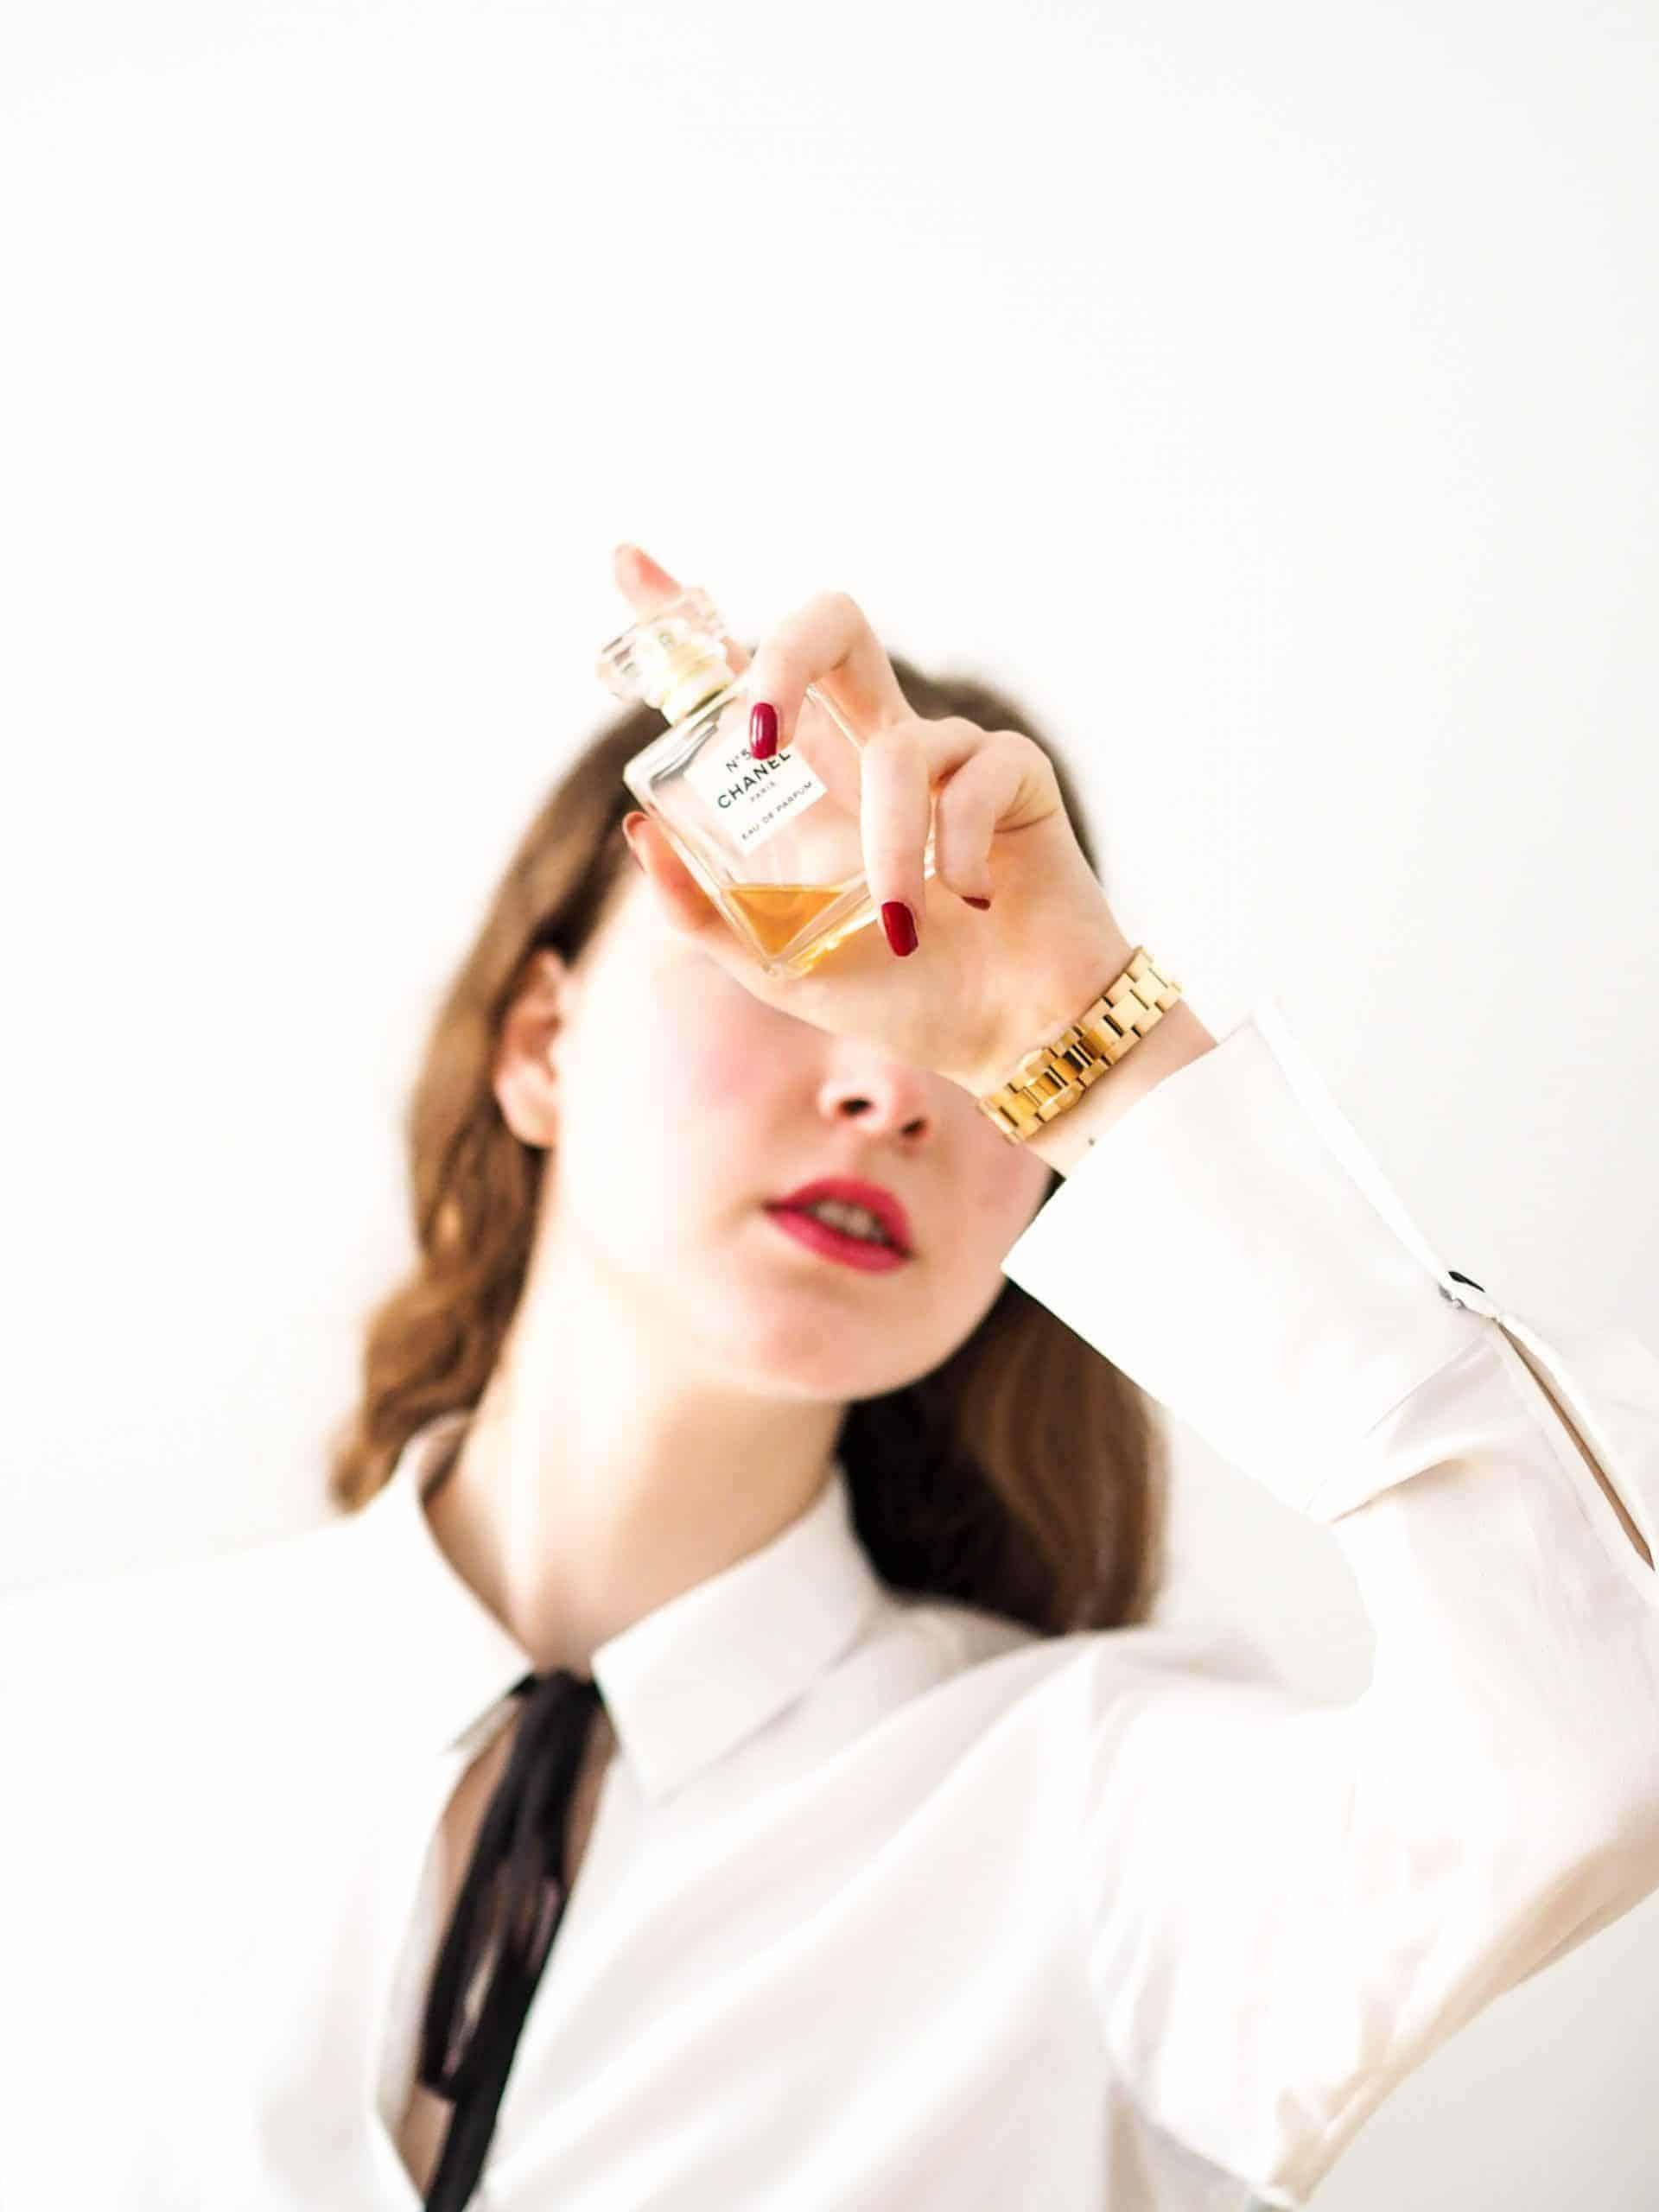 Woman holding Coco Chanel Perfume